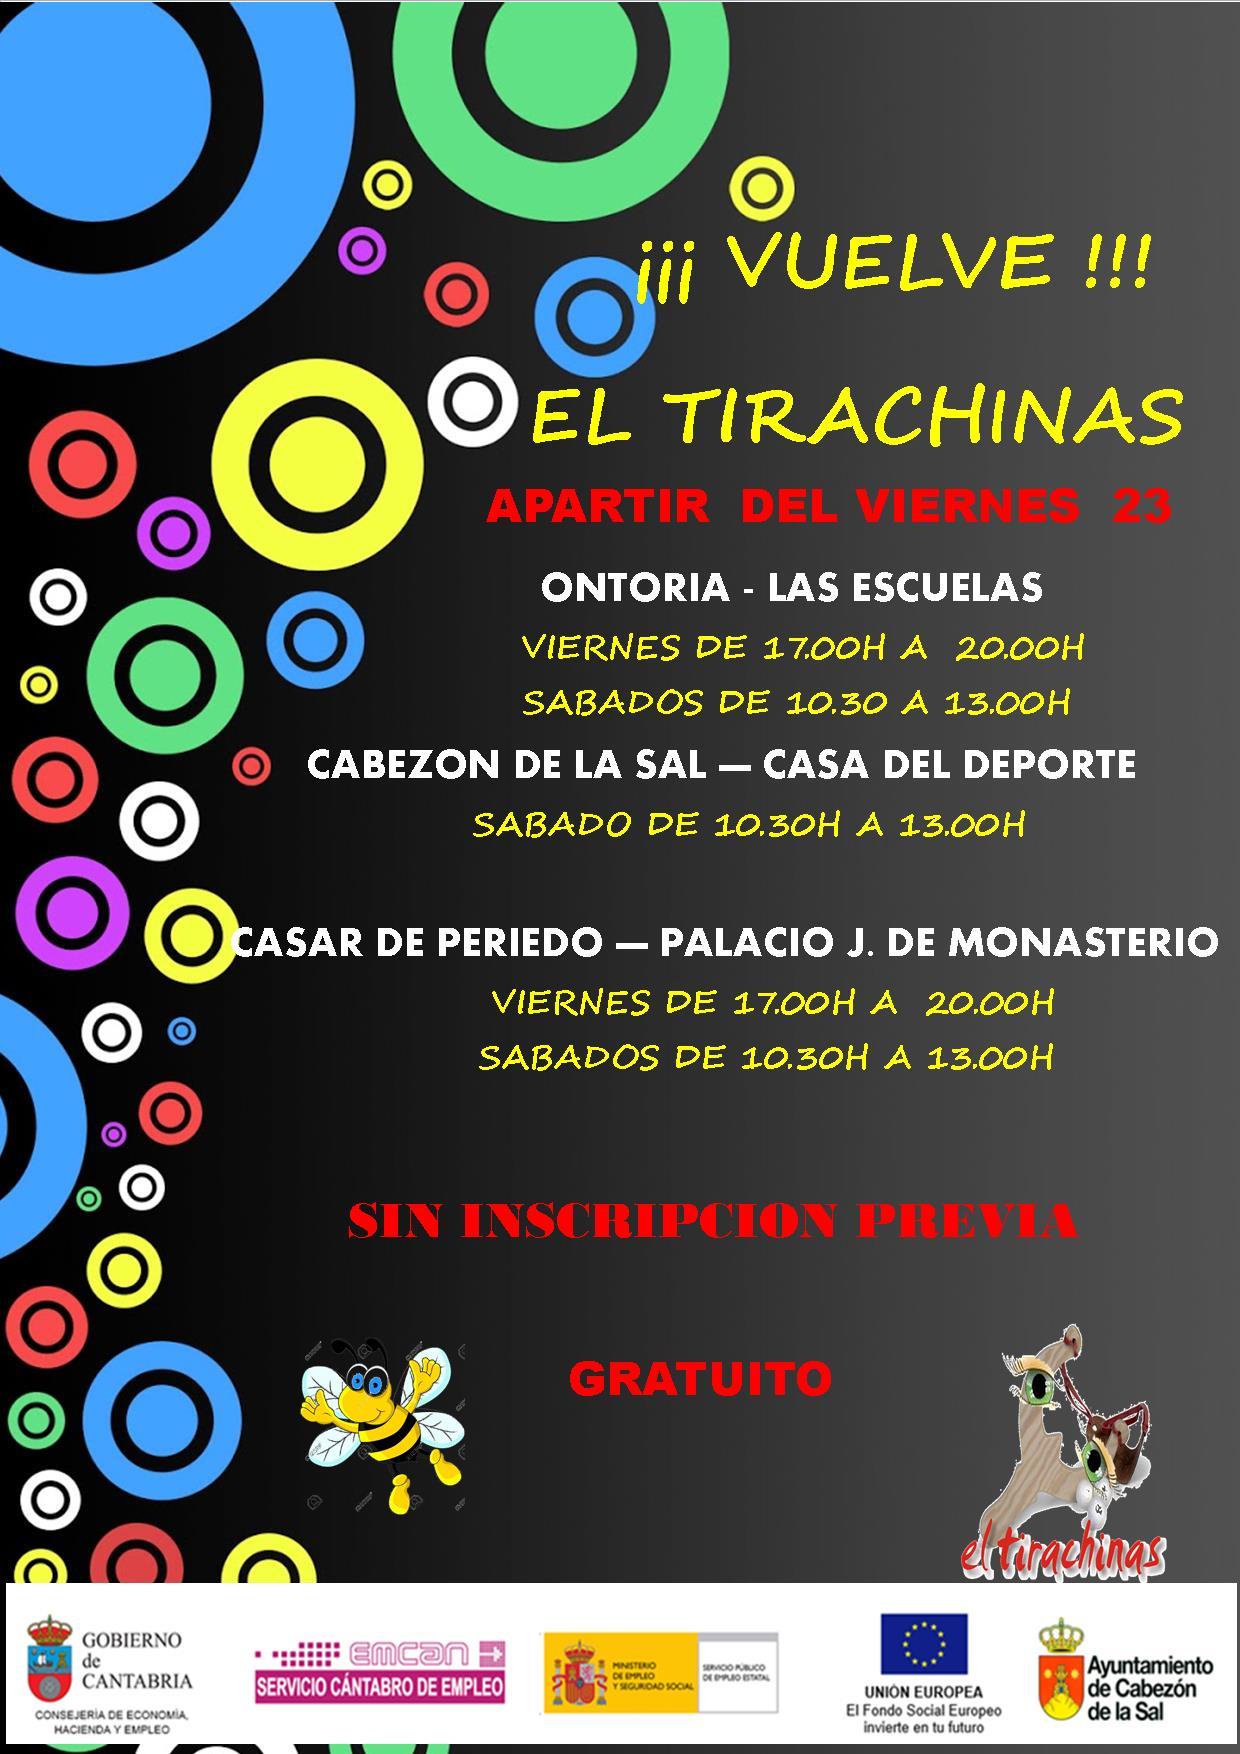 http://www.cabezondelasal.net/wp-content/uploads/2015/01/carteltirachinas.jpg